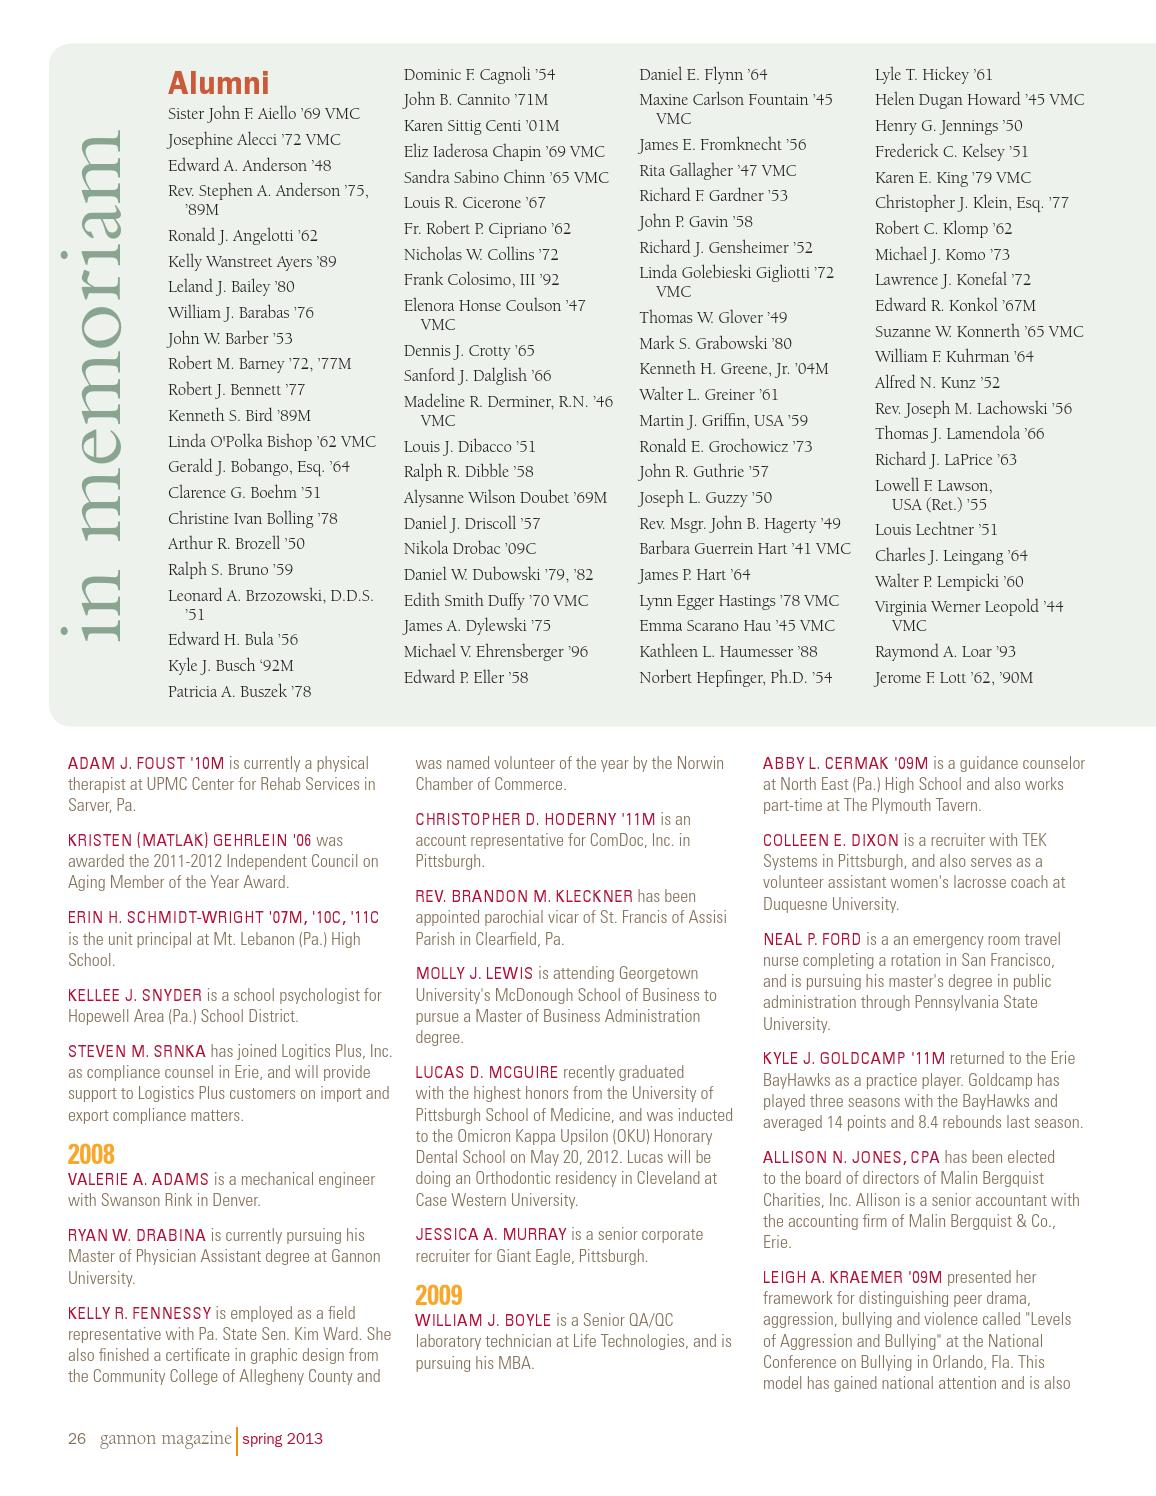 Gannon Magazine Spring 2013 by Gannon University - issuu